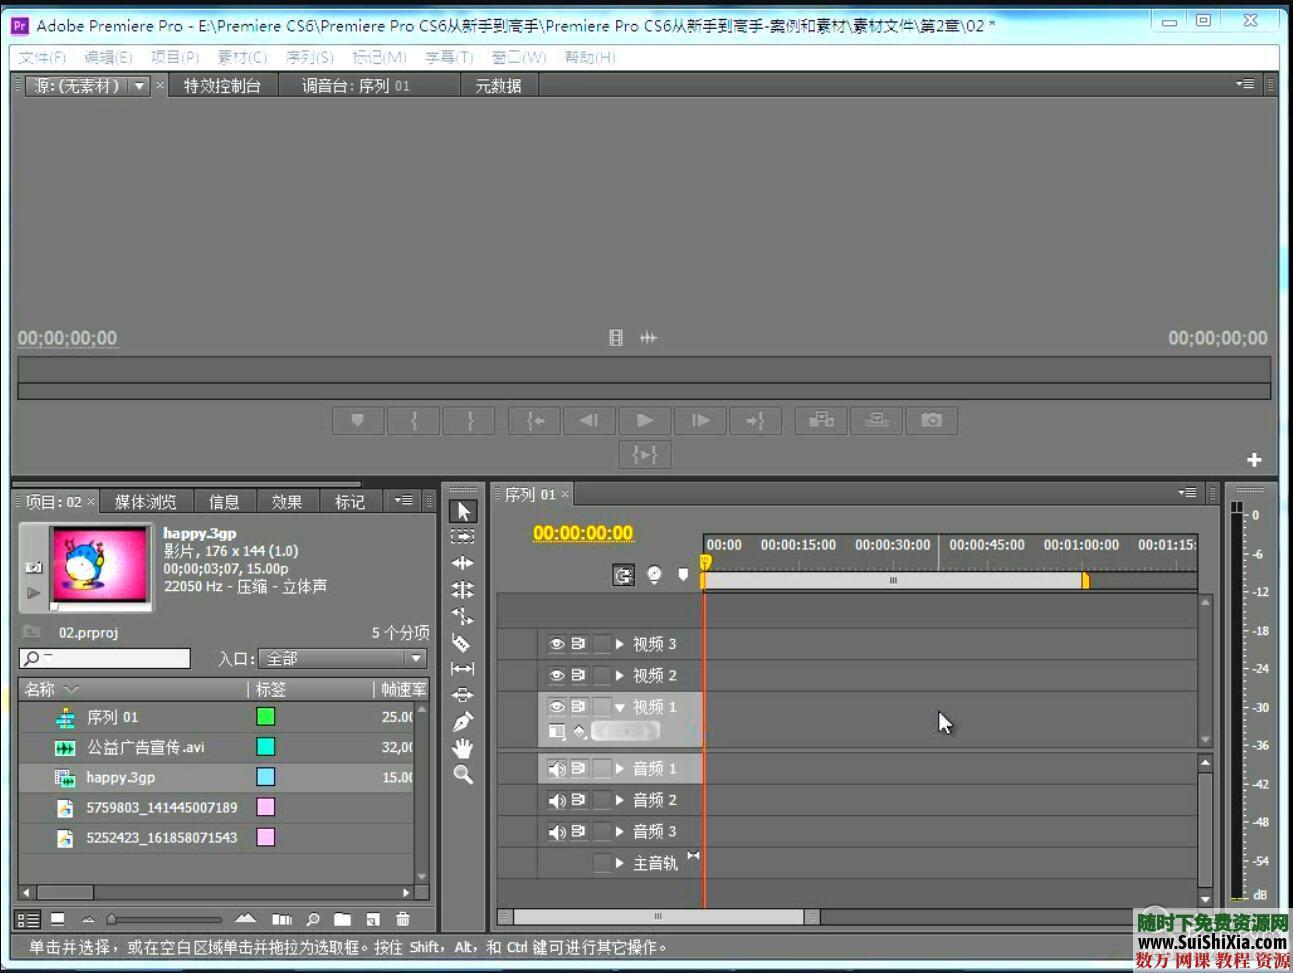 premiere pro cs6从零基础自学视频教程 第2张